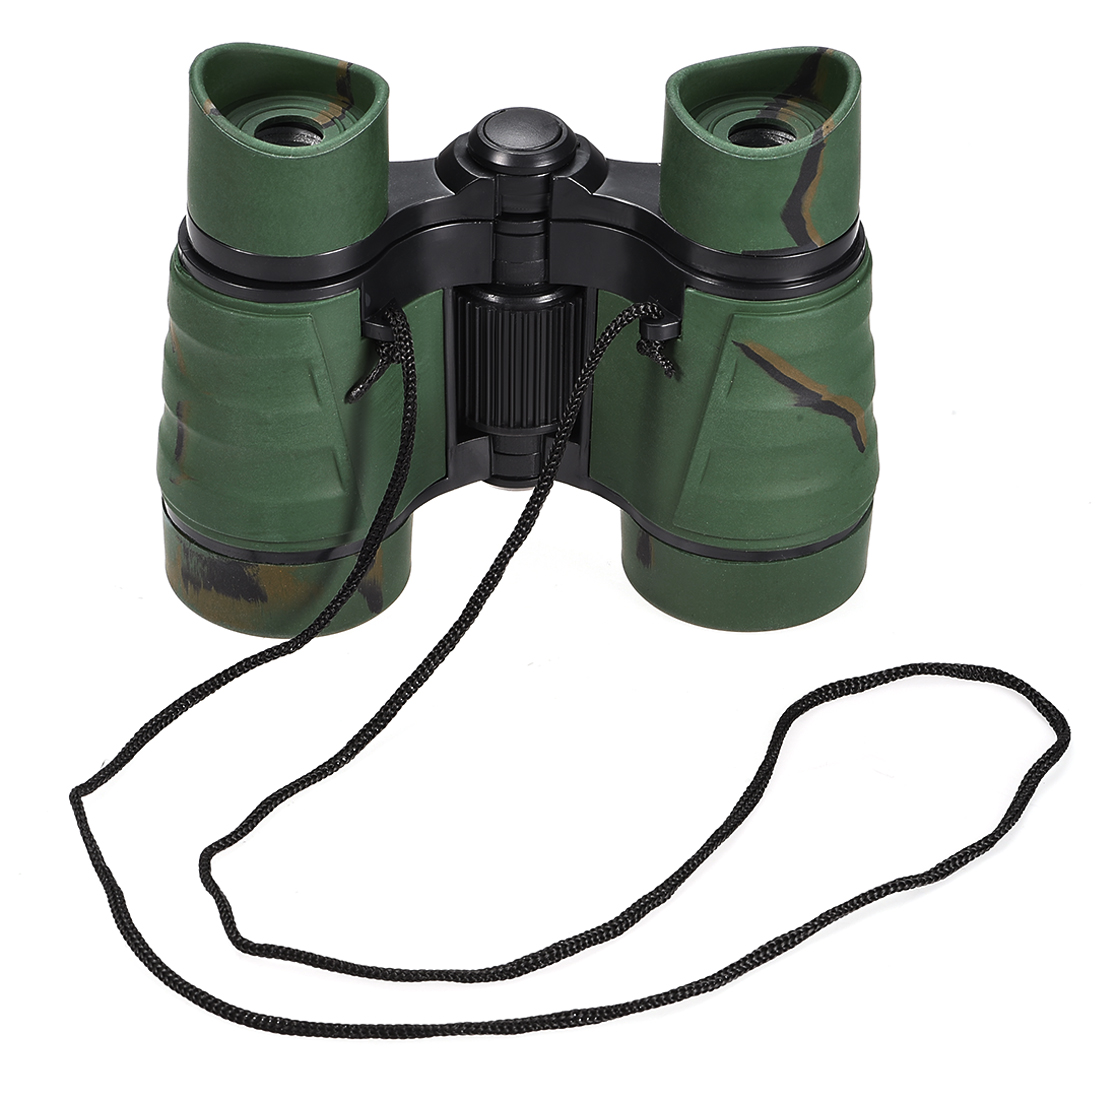 Toy Binoculars 4X30 Compact Foldable Binoculars Shock Proof Dark Green